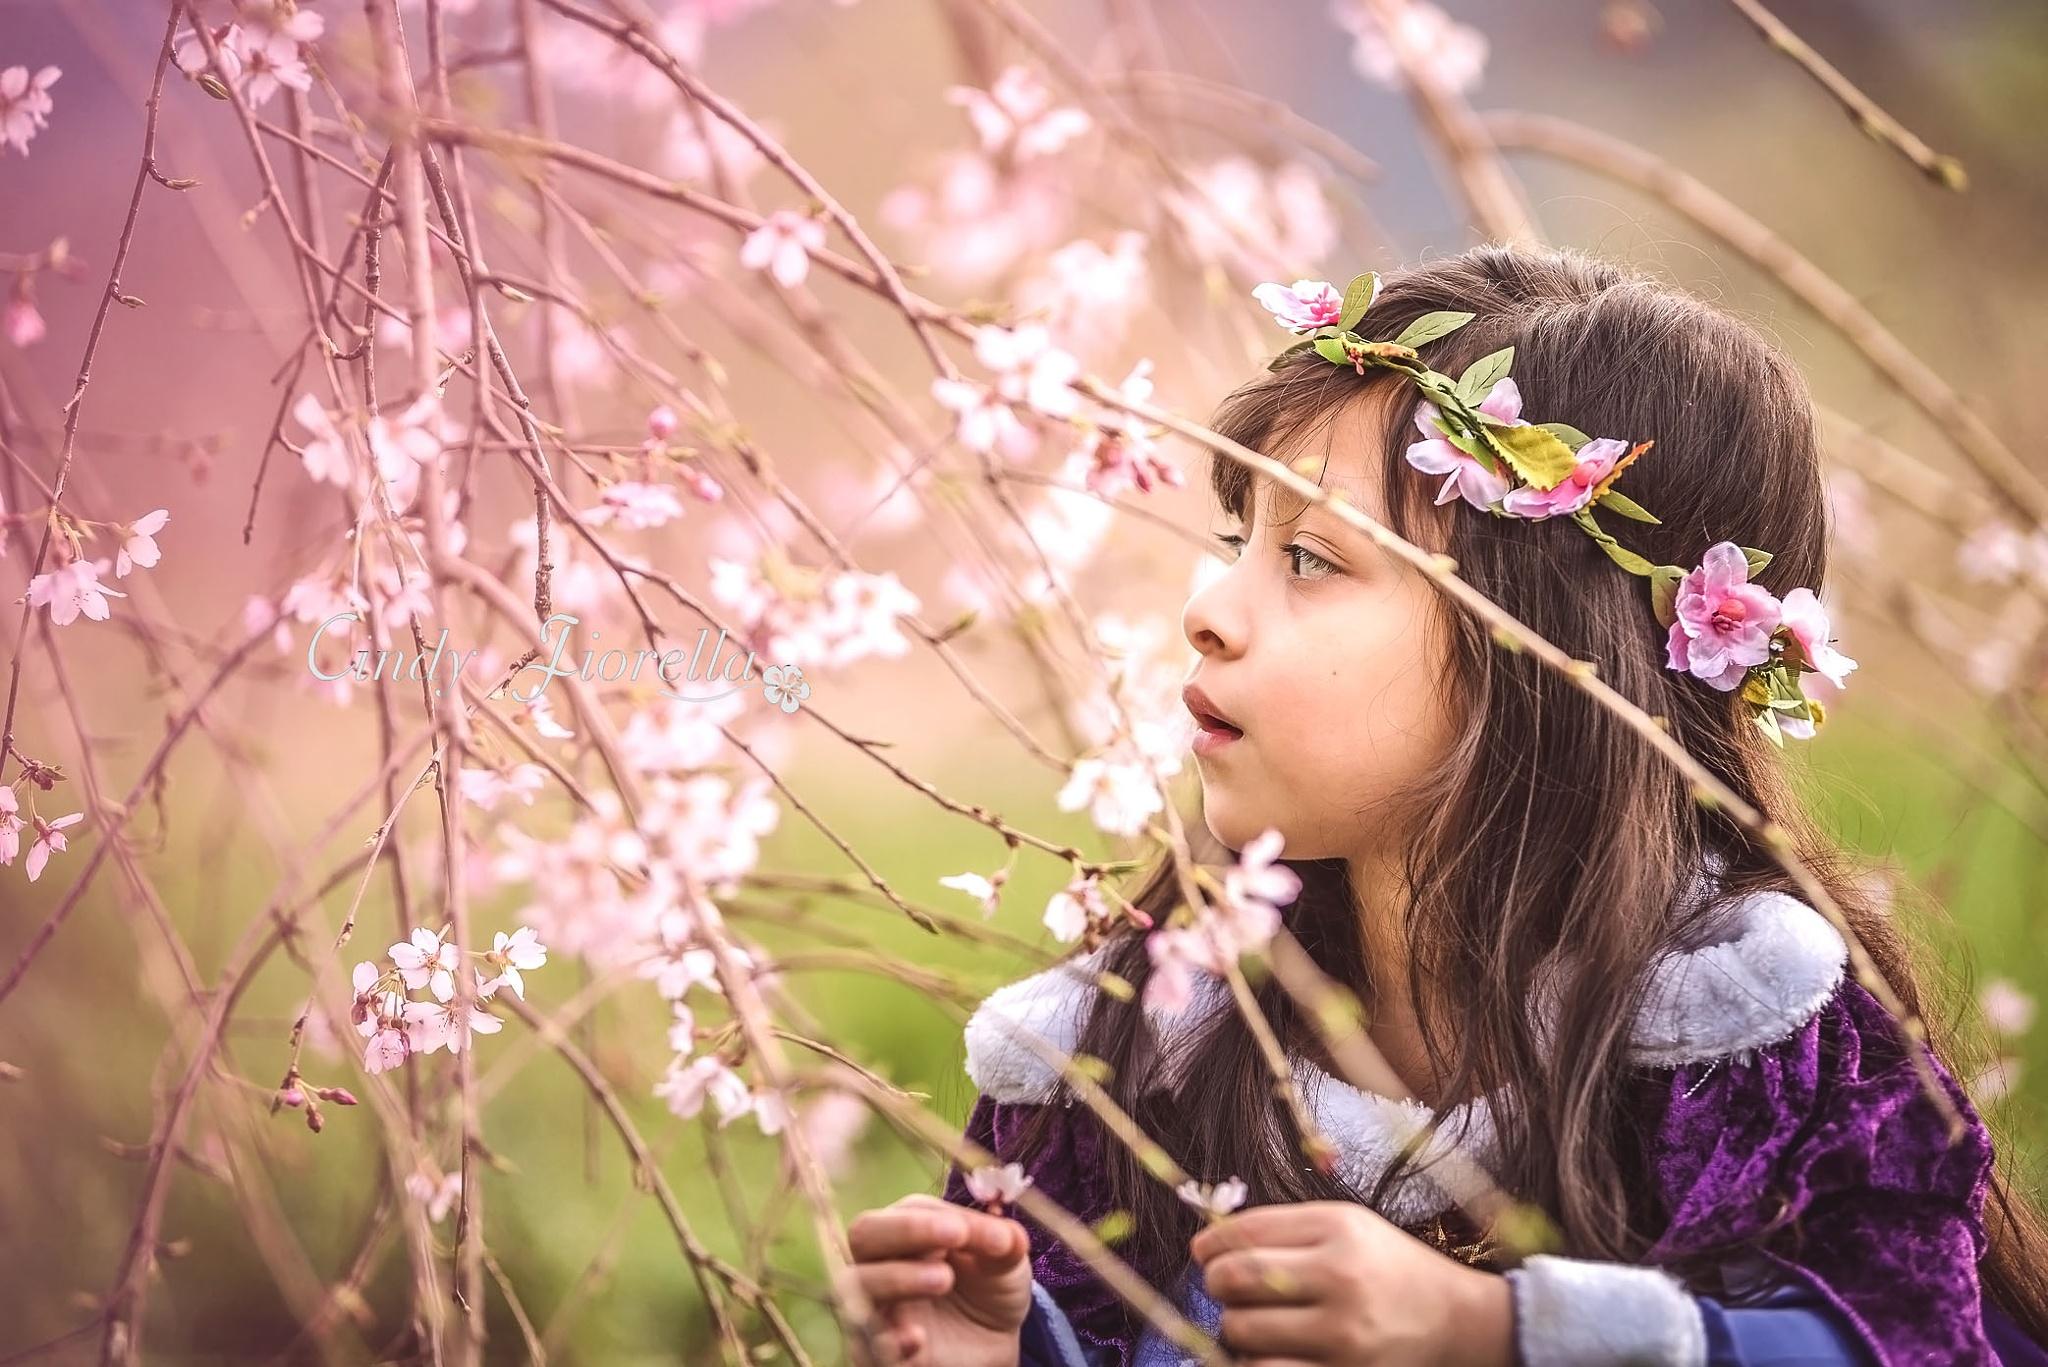 Spring by Cindy Soto de Chamochumbi